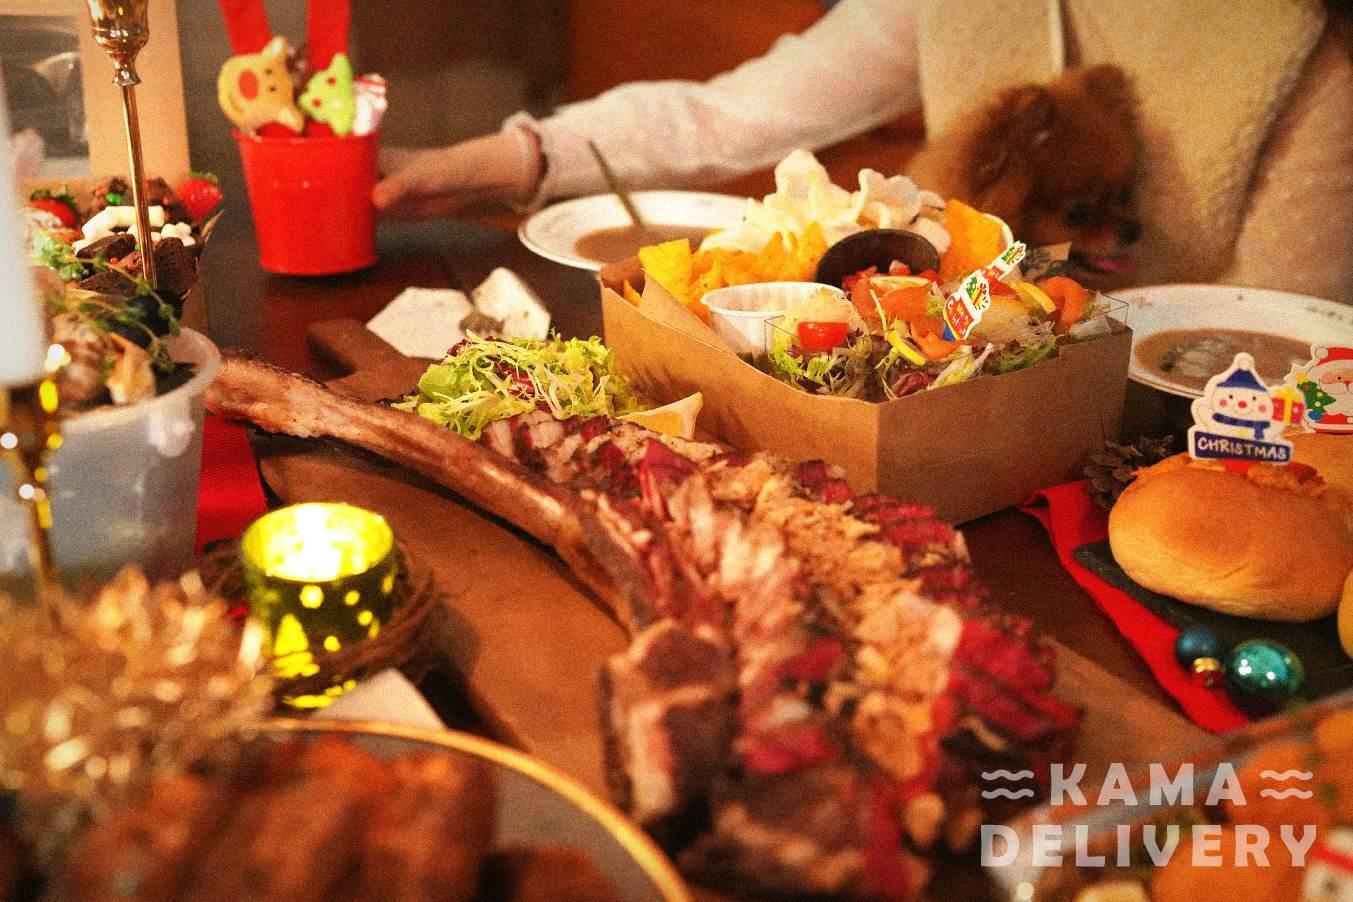 Kama Delivery 聖誕美食到會外賣服務 專享各種到會優惠